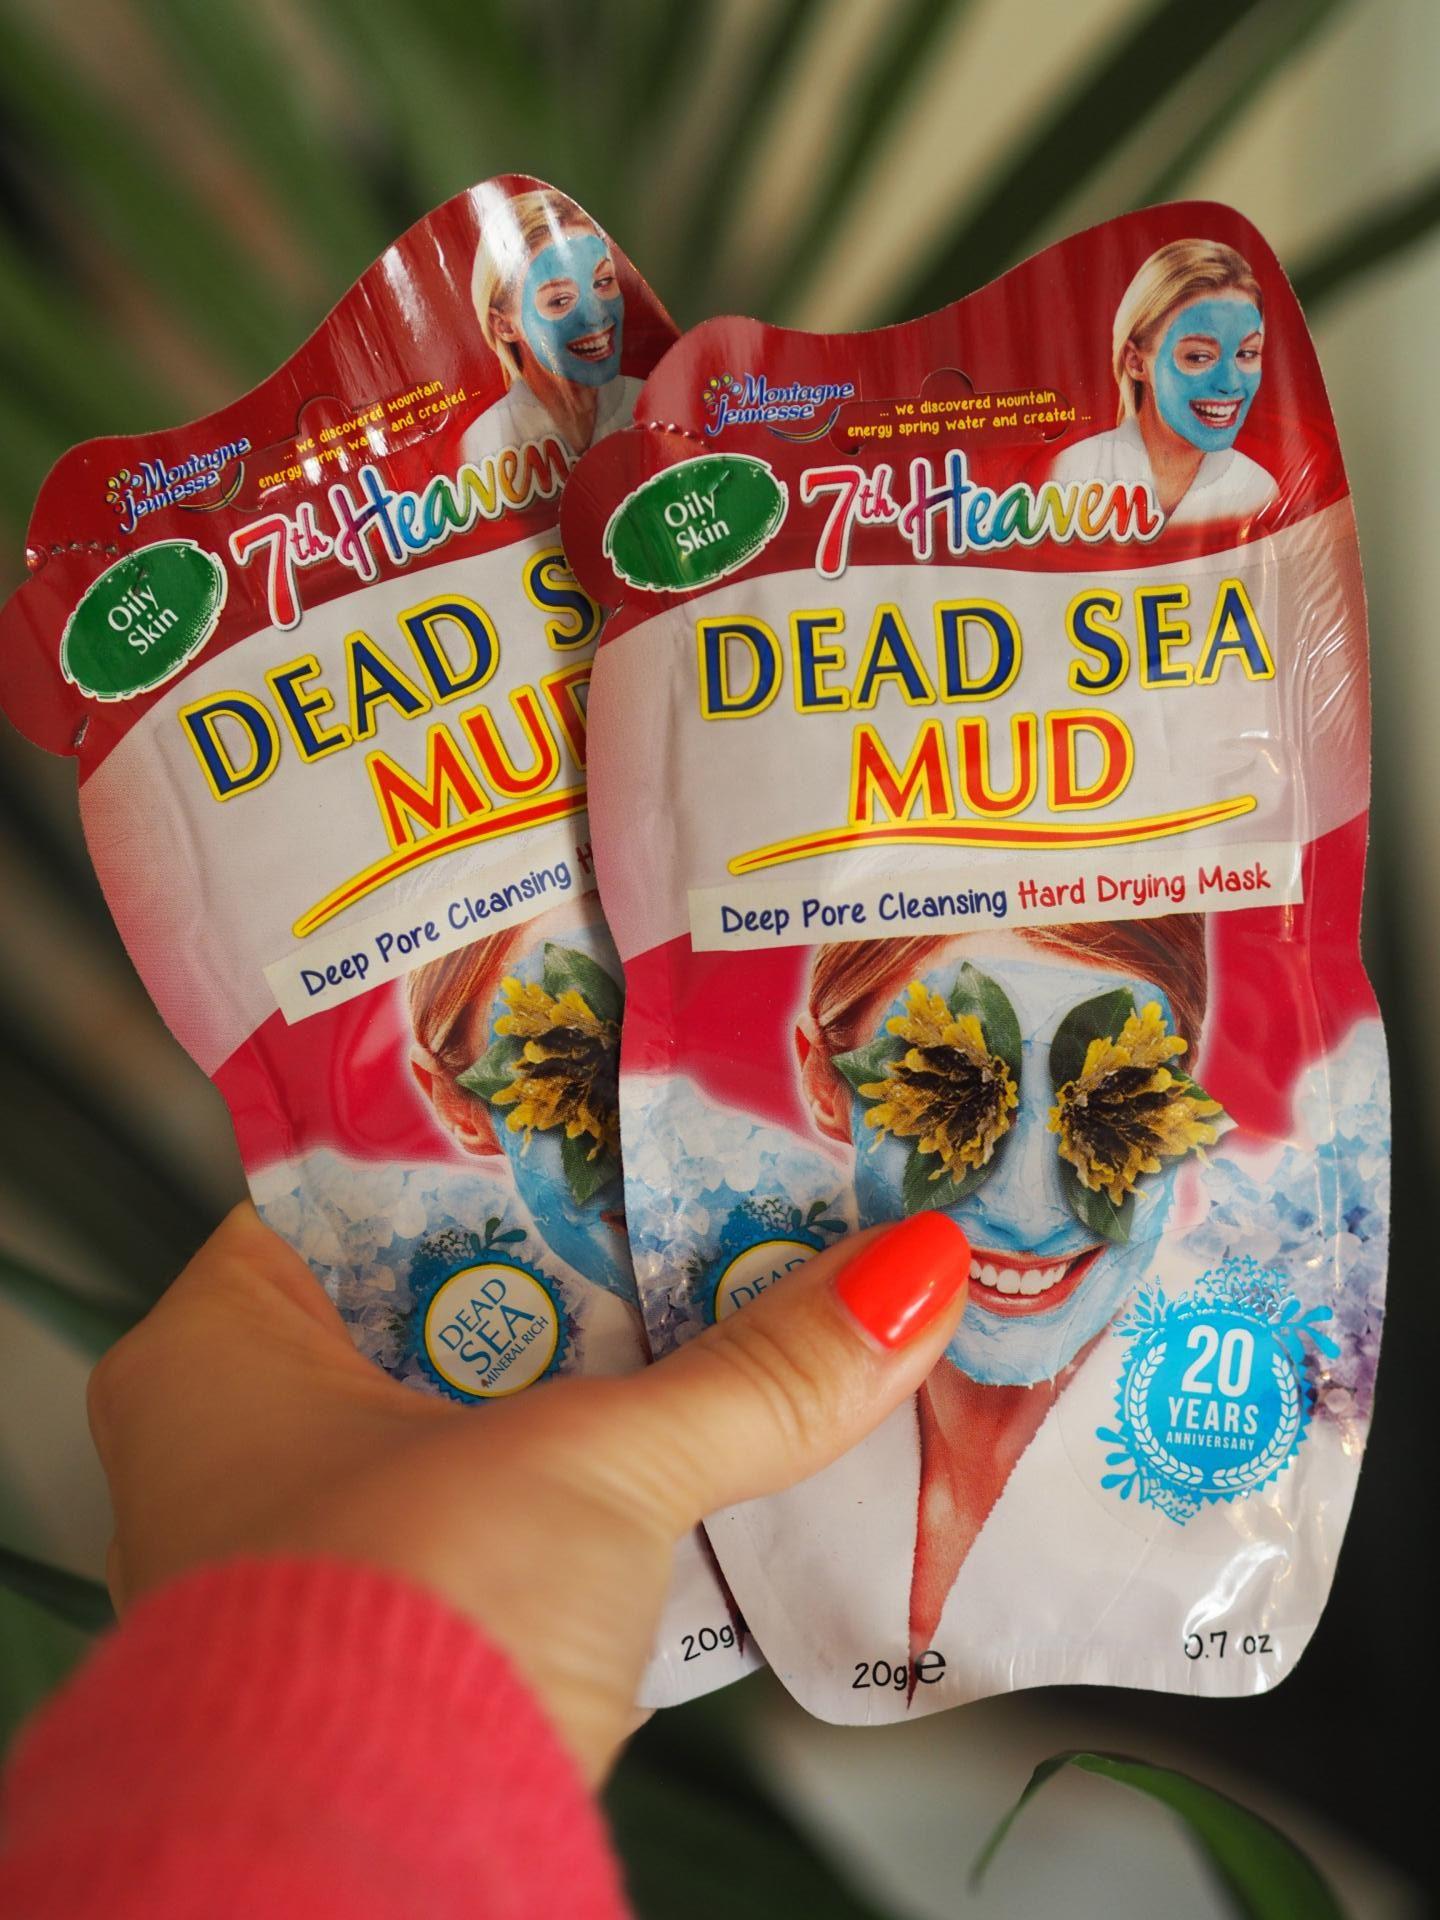 7th Heaven Mud Mask - 7th Heaven DEAD SEA MUD